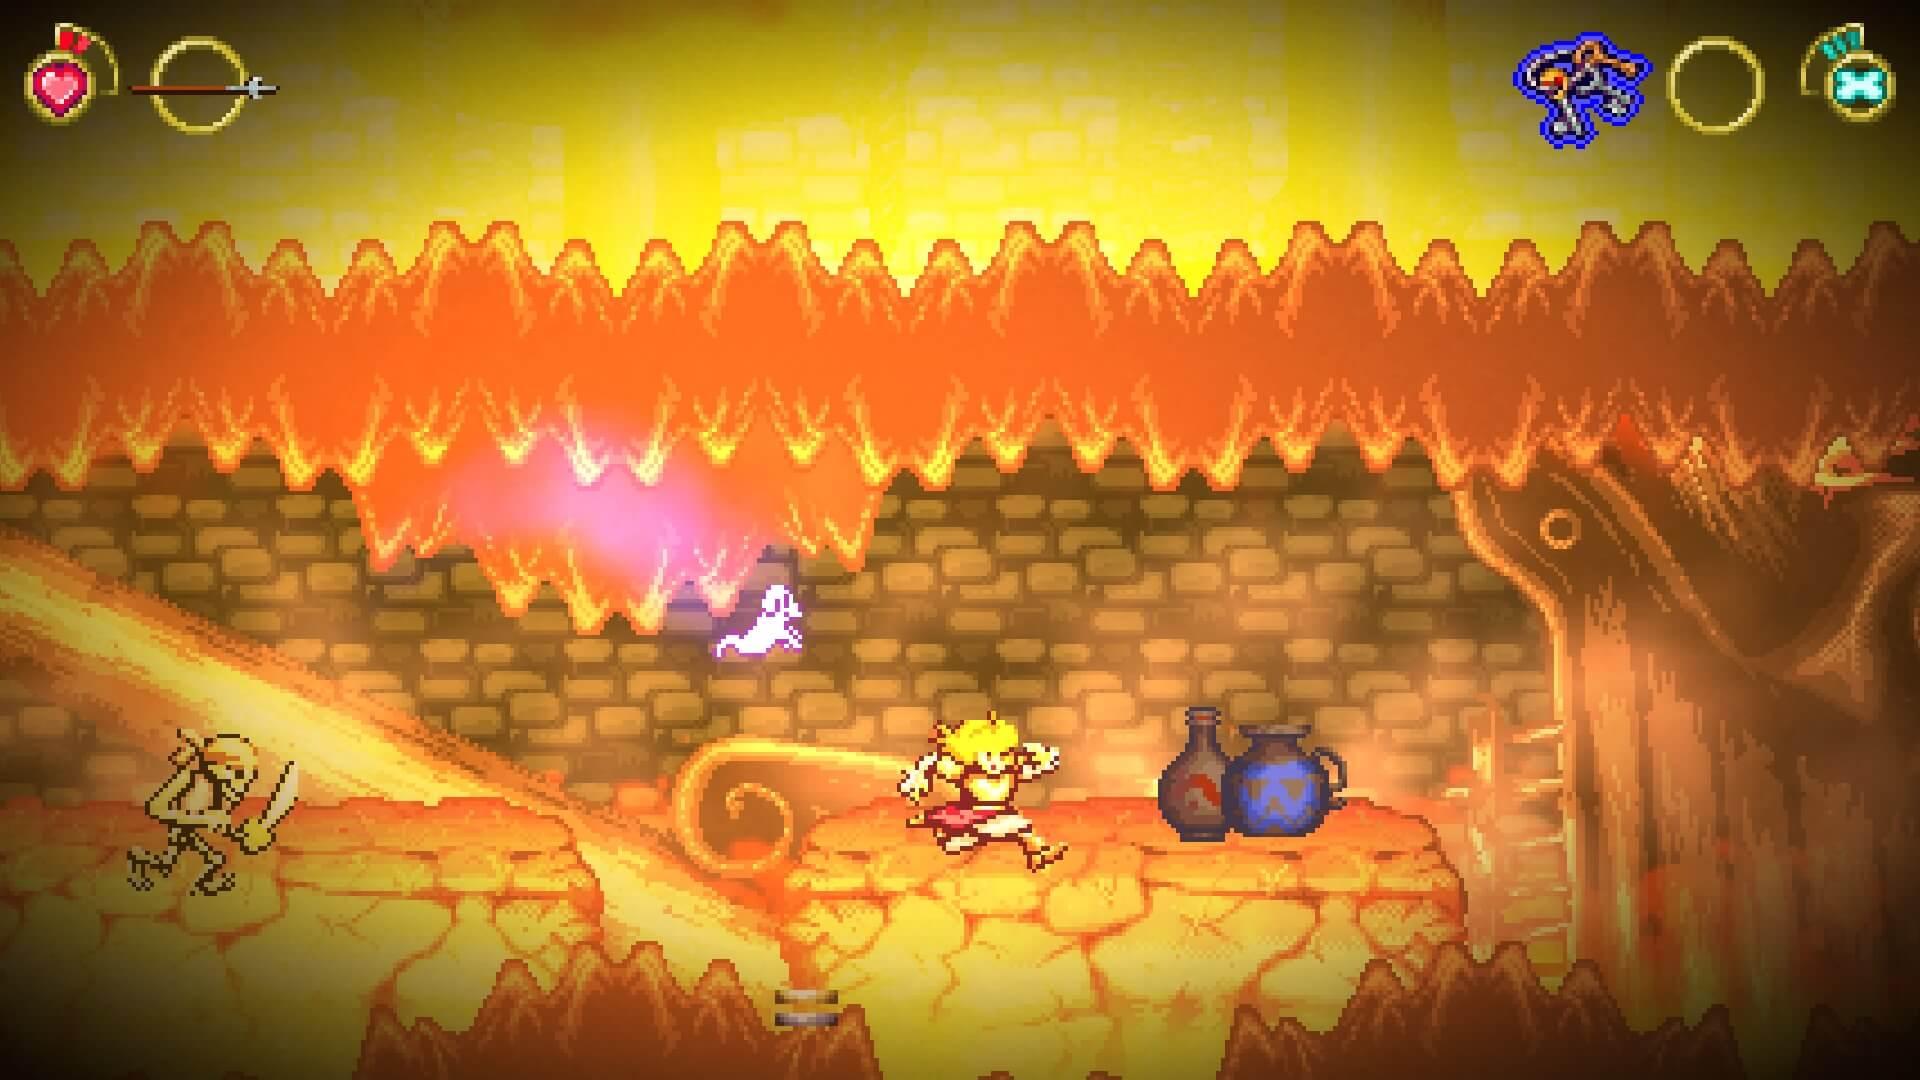 Battle Princess Madelyn, Delfos, Causal Bit Games, Ghouls 'N Ghosts